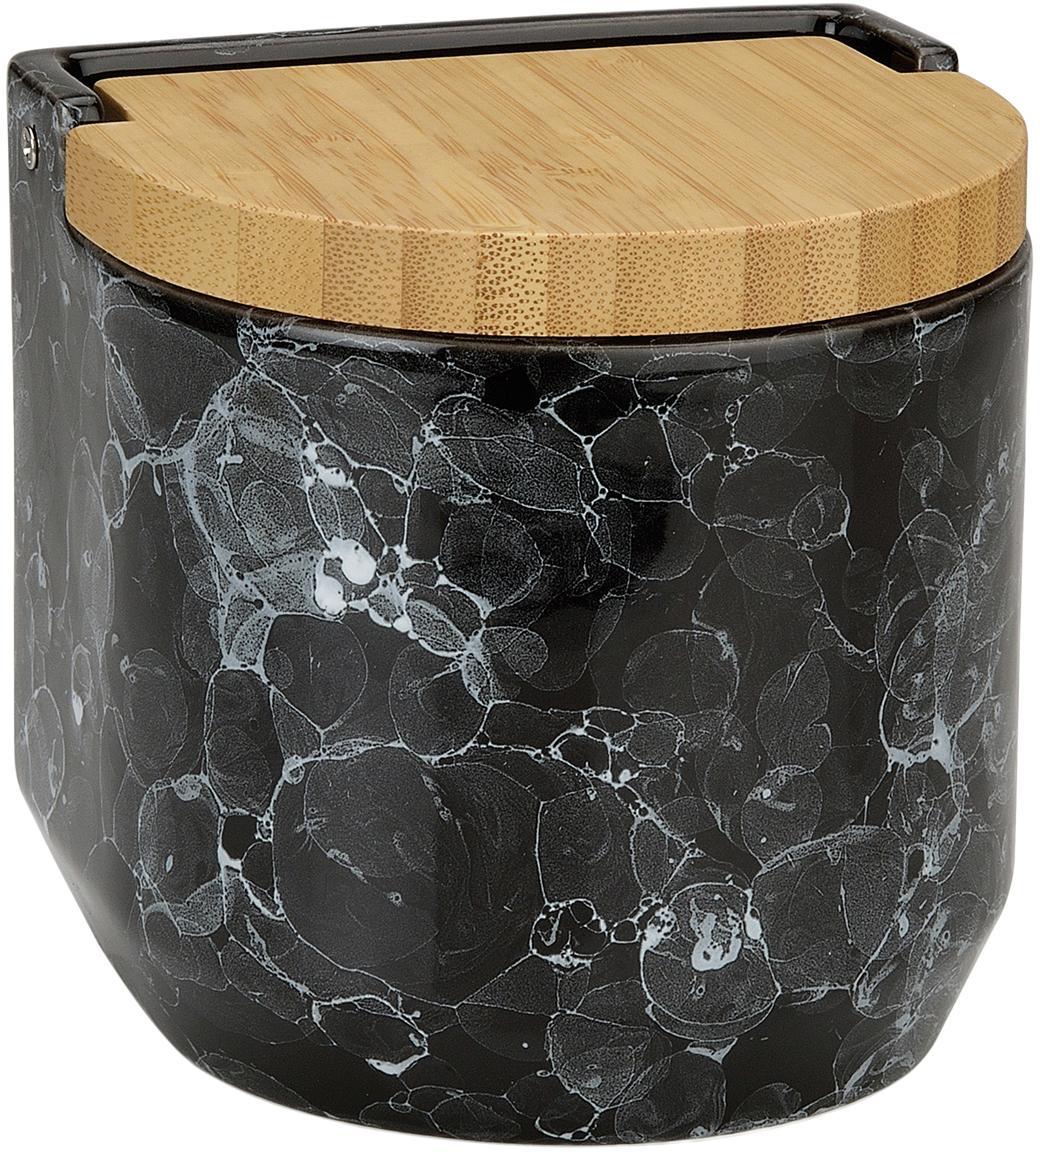 Bote en aspecto mármol Bubble, Cerámica, bambú, Negro, Ø 12 x Al 12cm